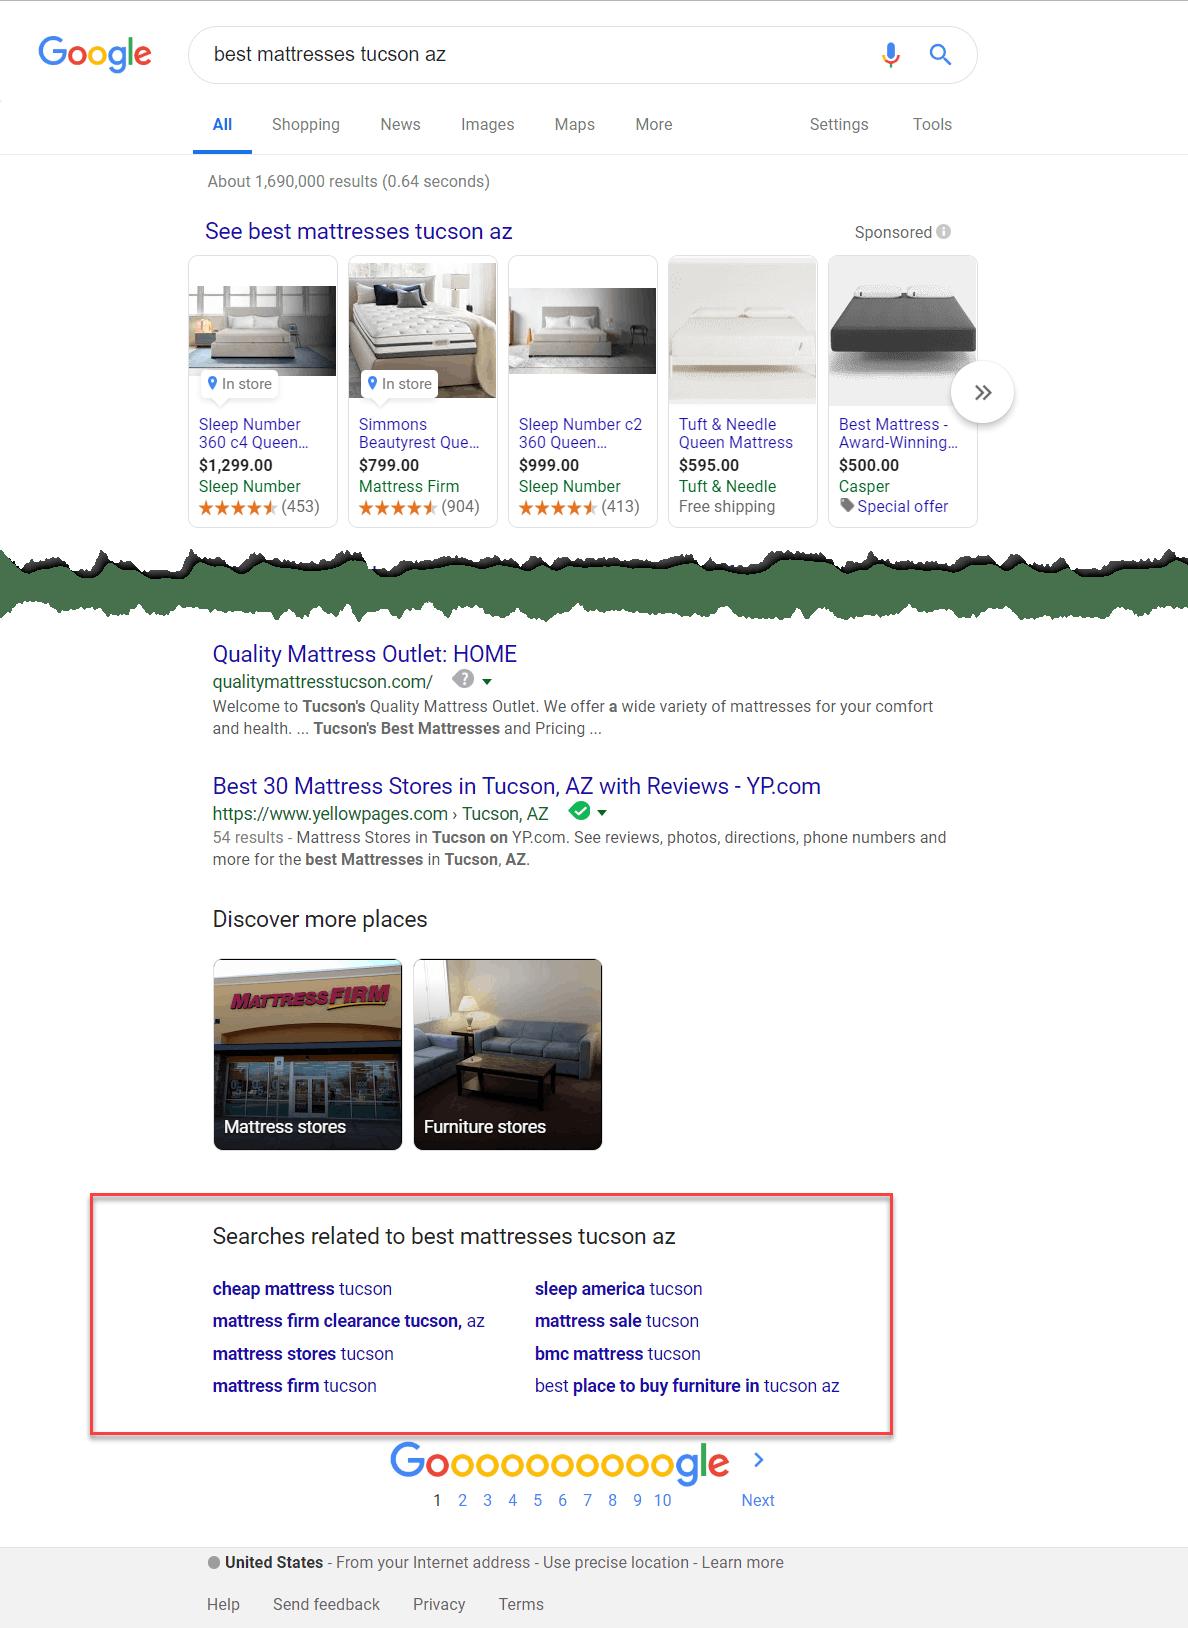 best mattresses Tucson Google search